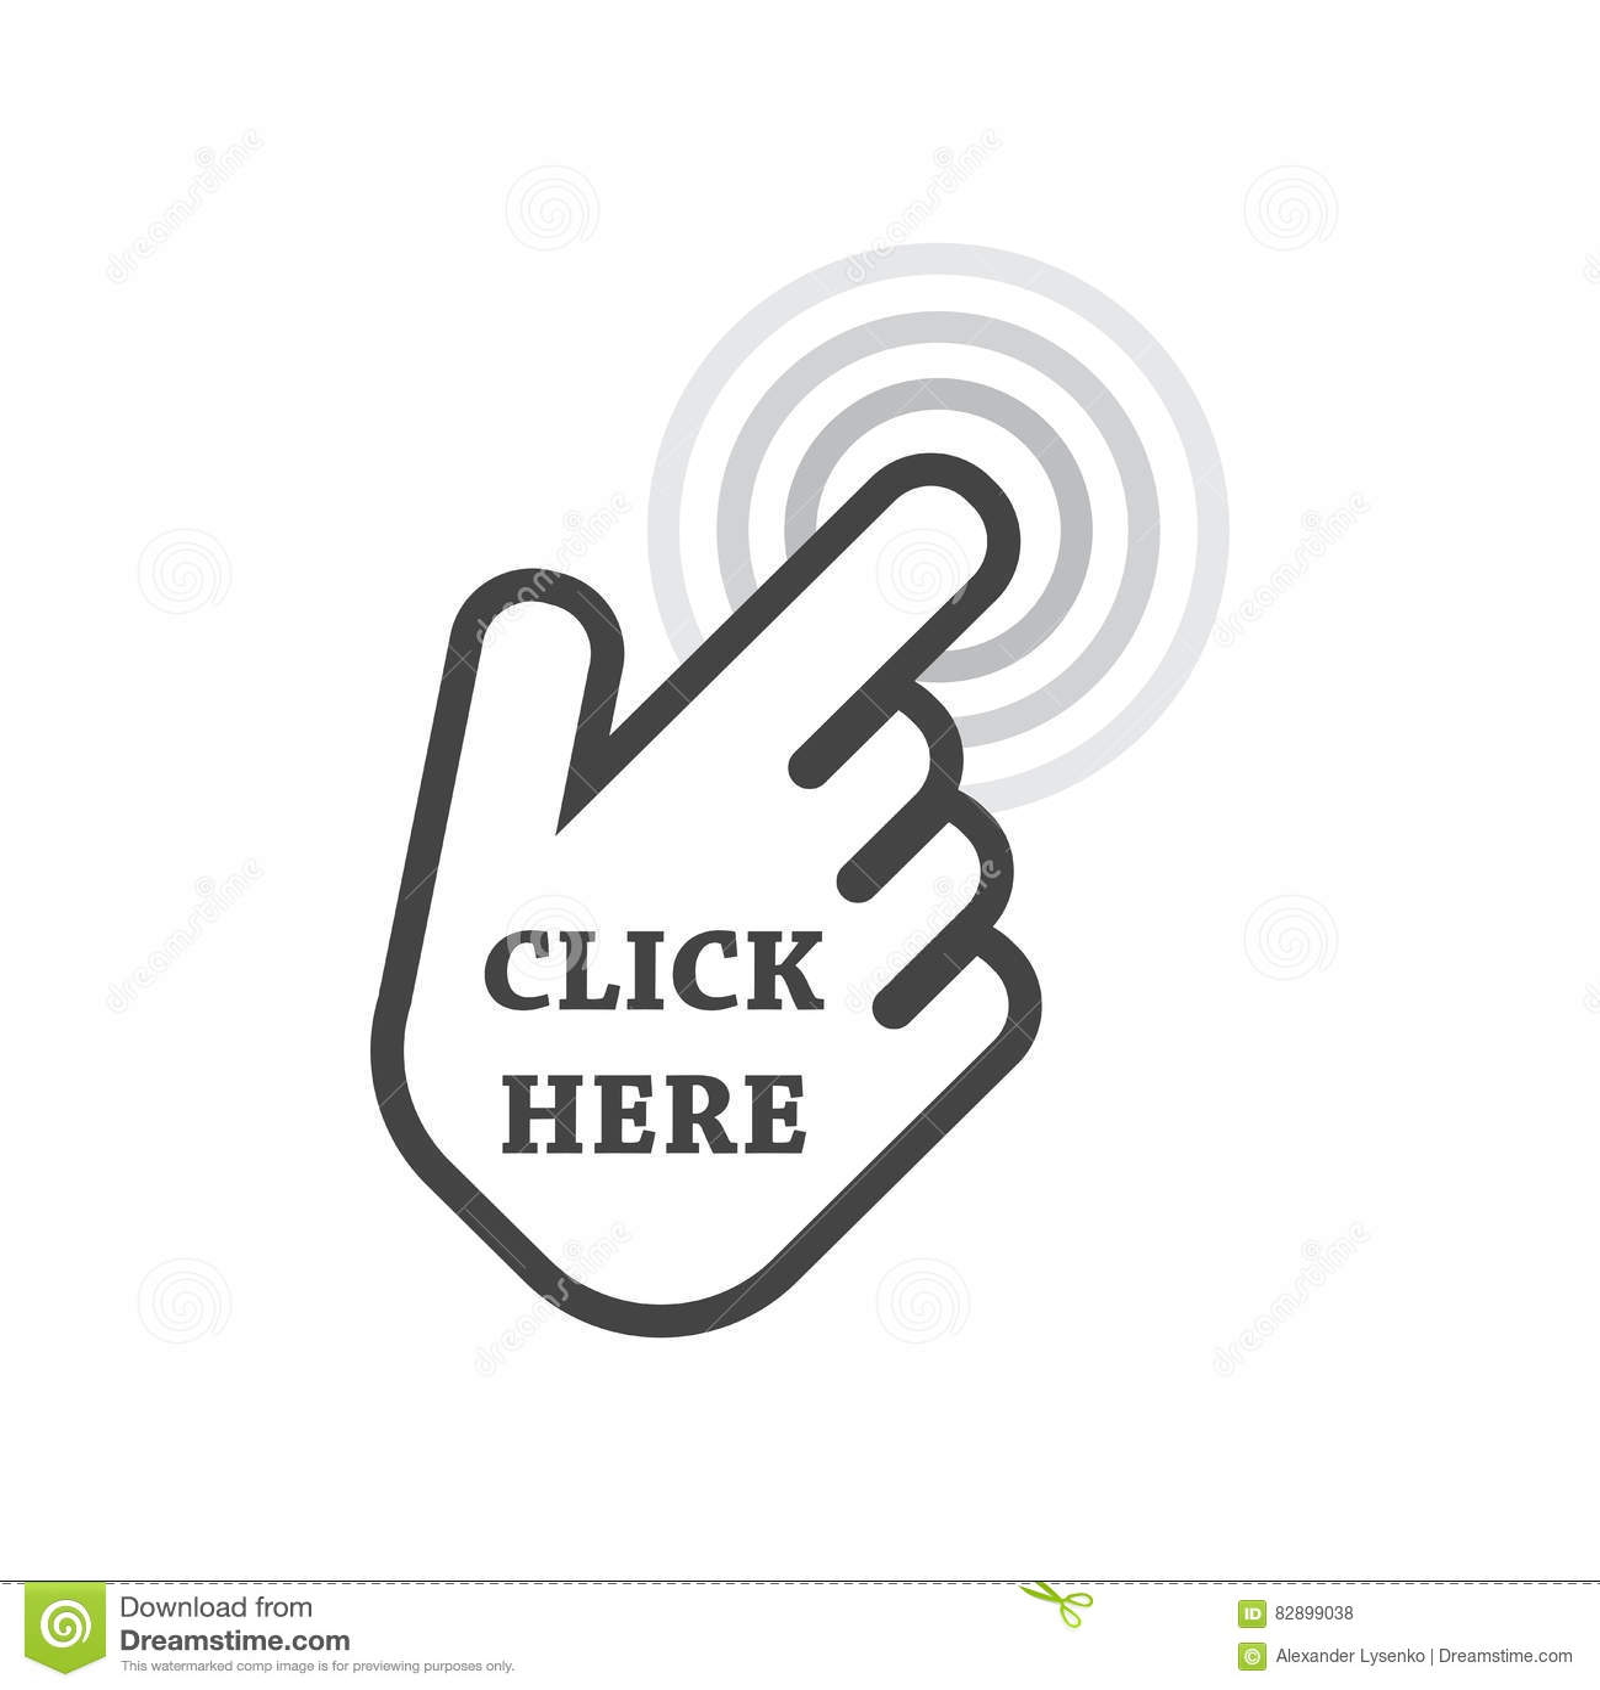 click here finger images reverse search. Black Bedroom Furniture Sets. Home Design Ideas